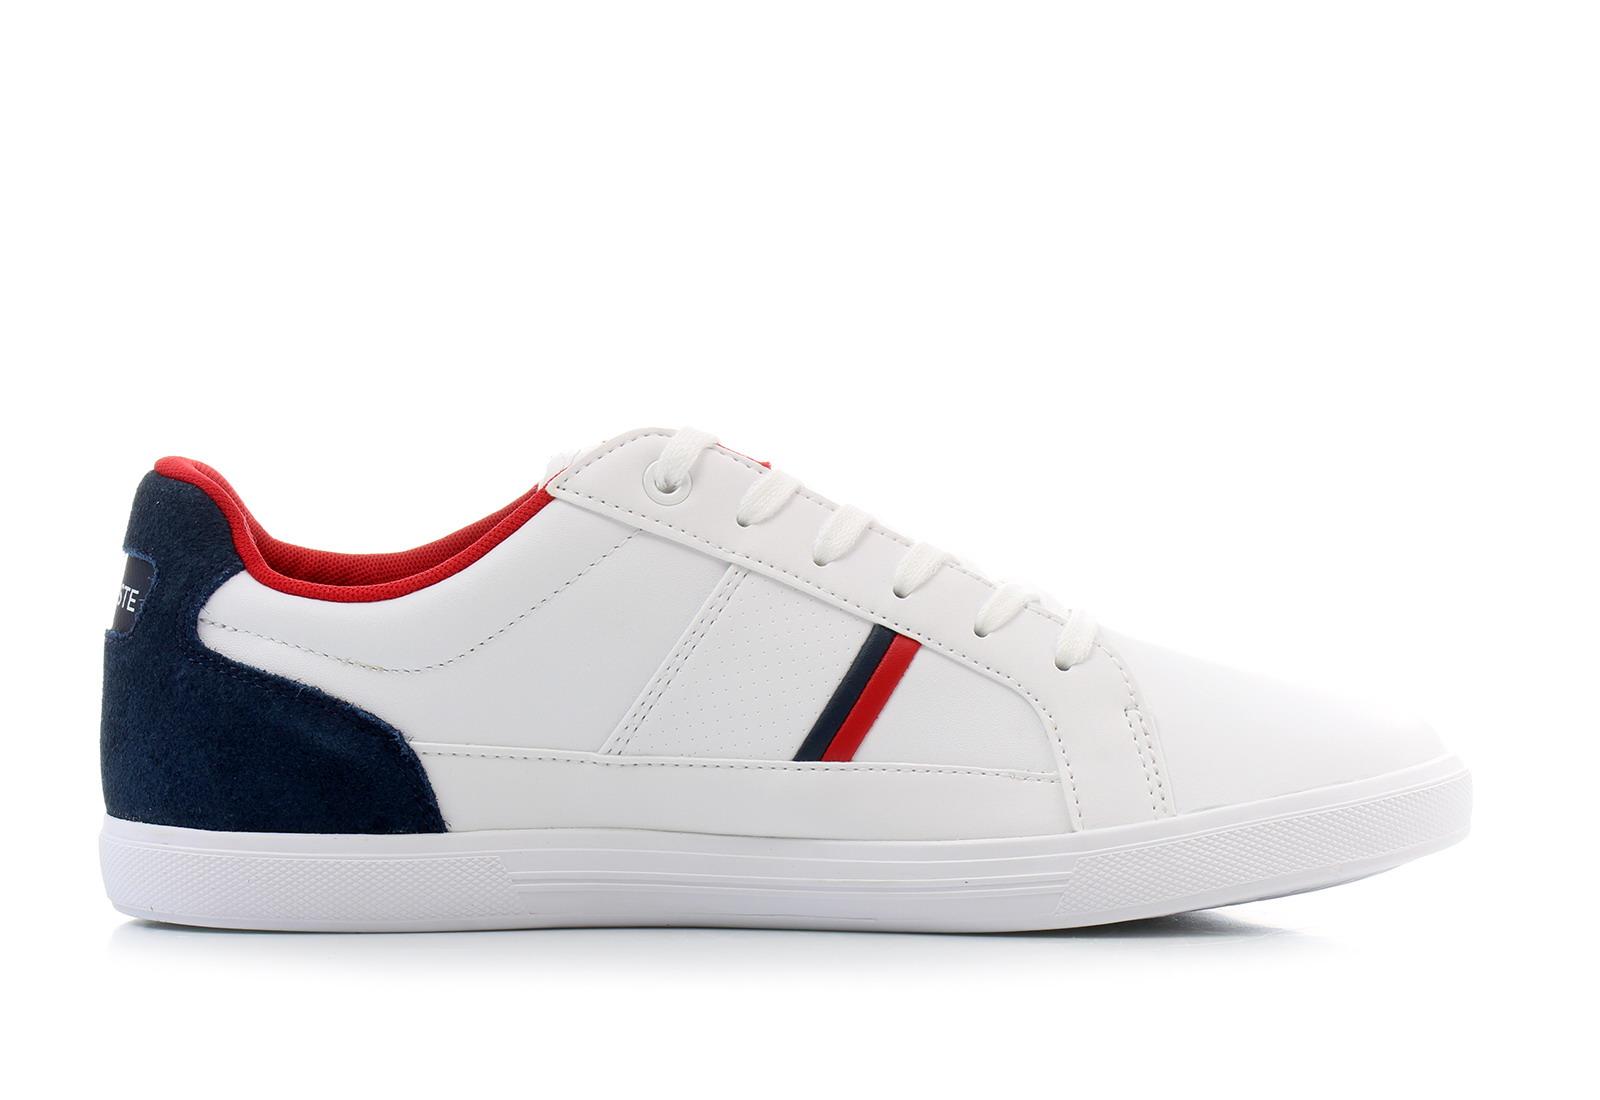 Lacoste Cipő - Europa - 173SPM0012-042 - Office Shoes Magyarország 47ac53237a